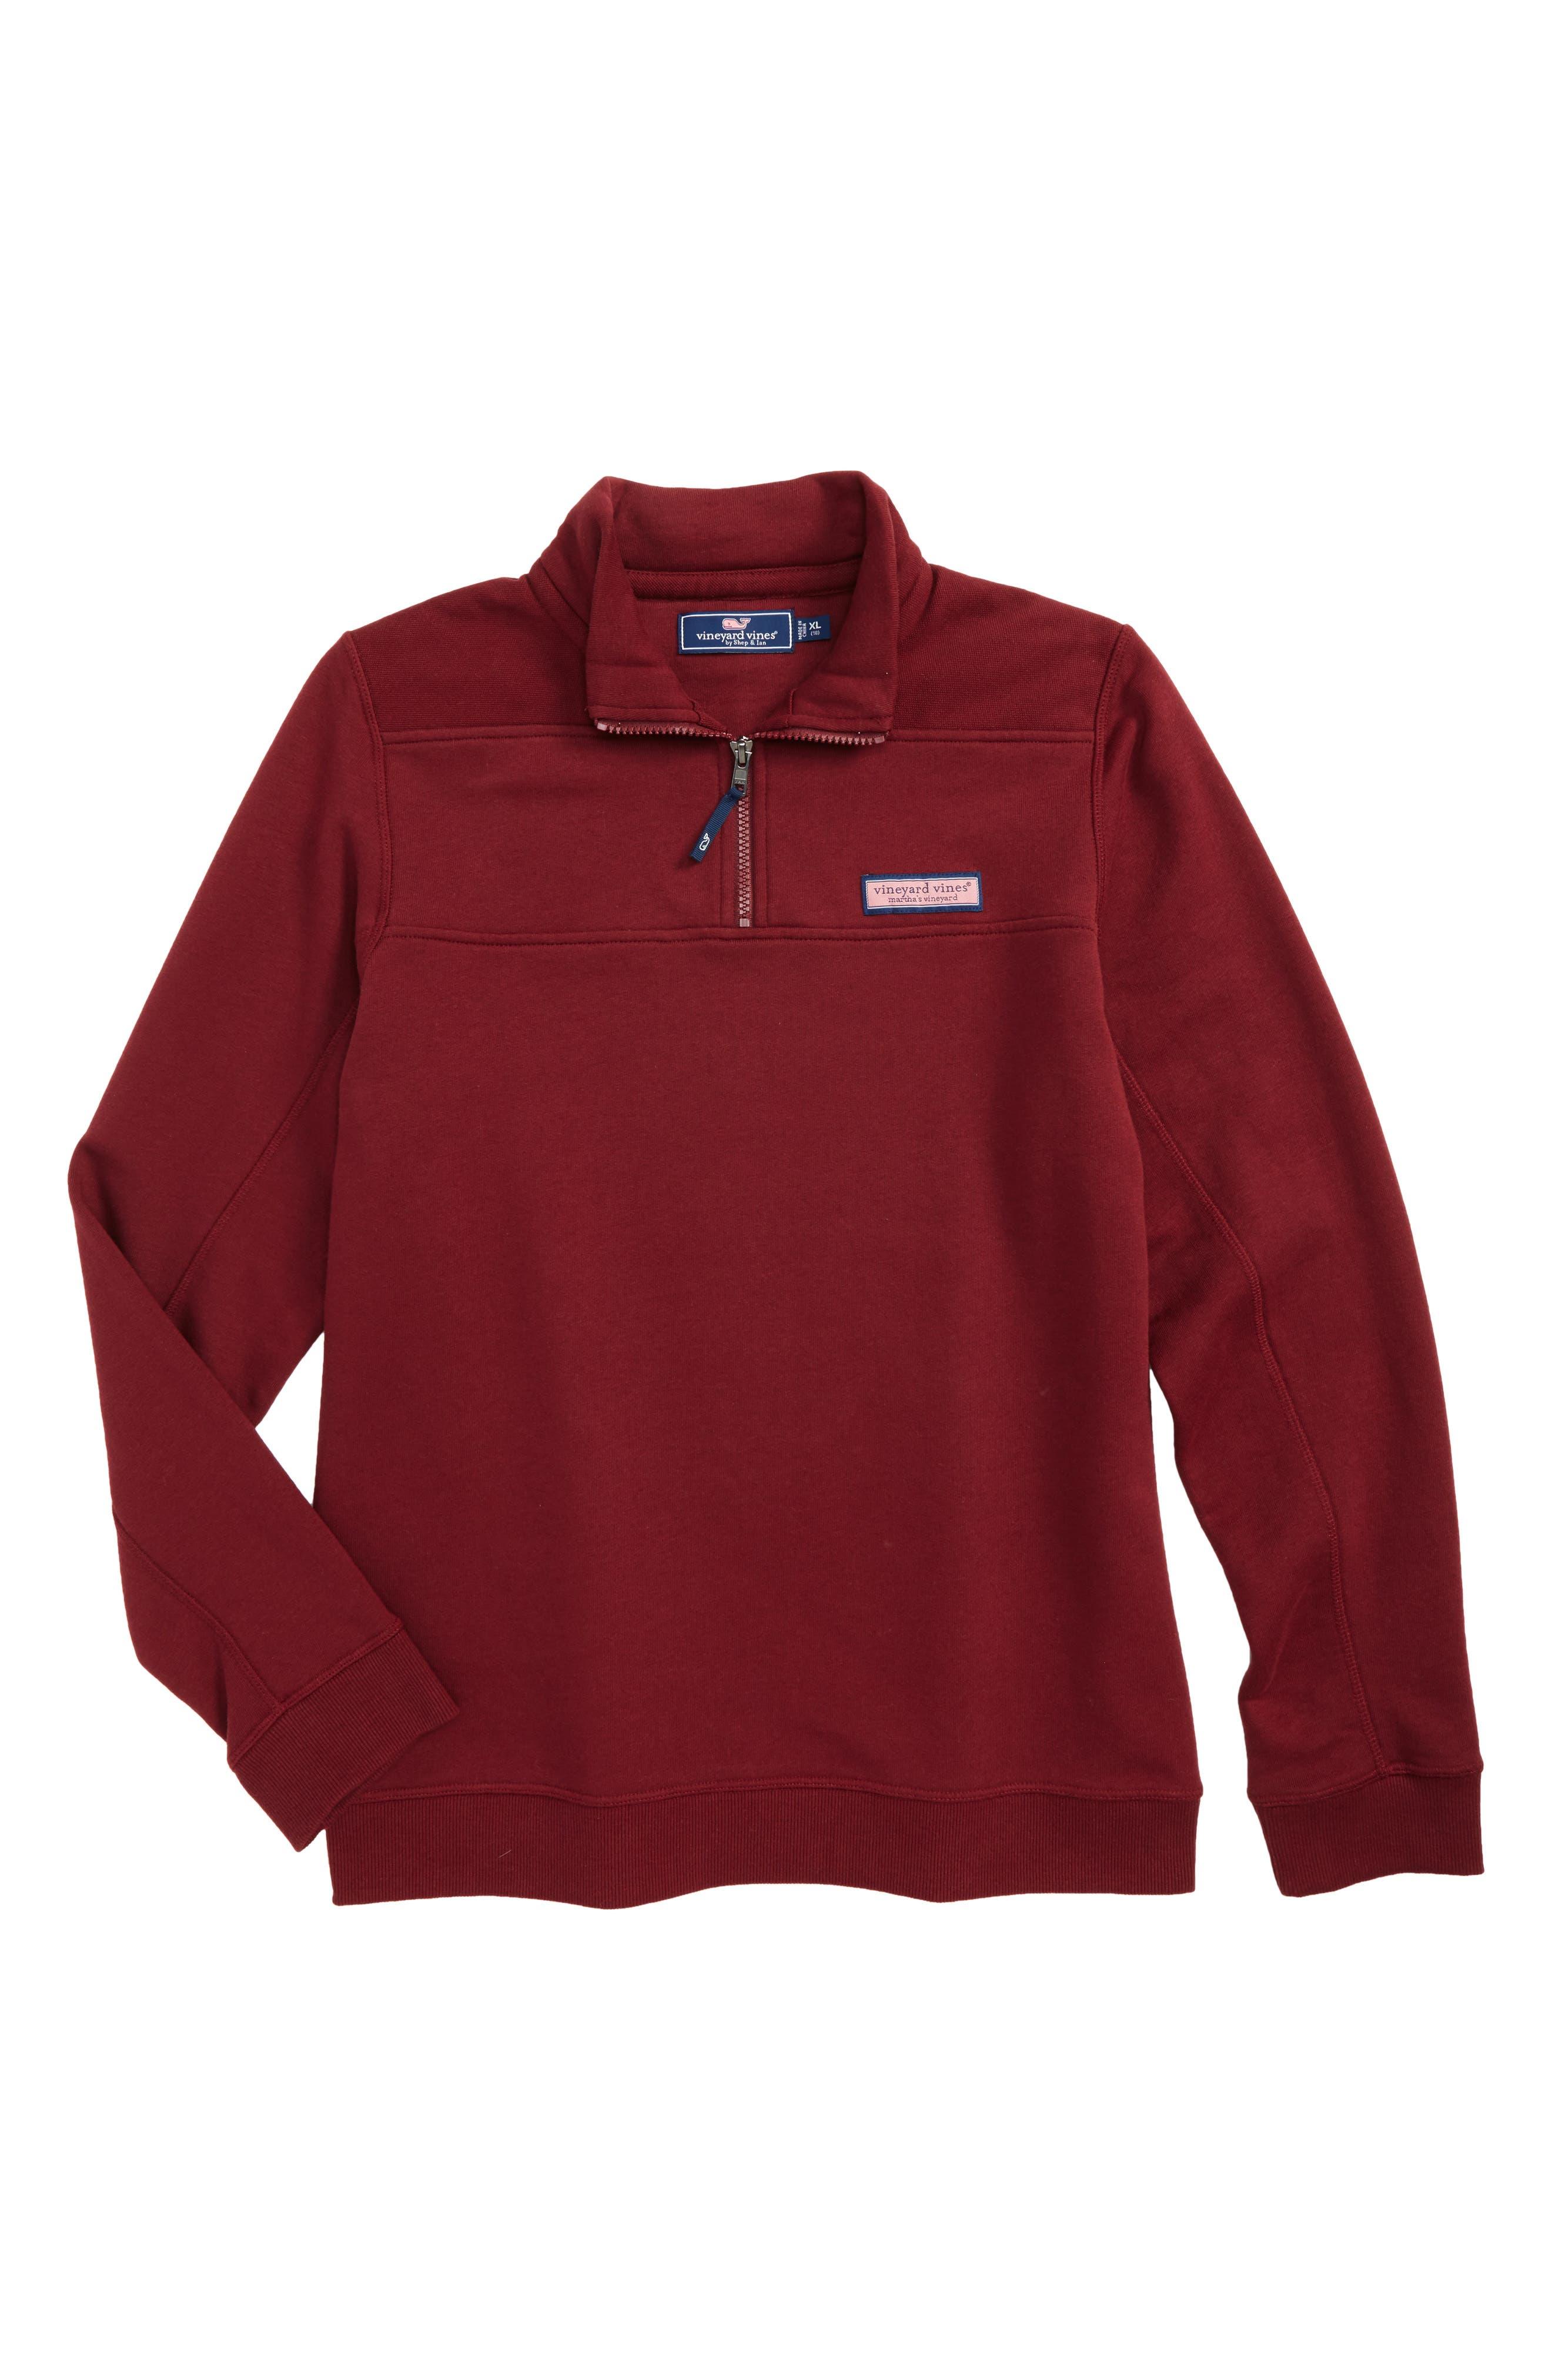 VINEYARD VINES Classic Shep Quarter Zip Pullover, Main, color, CRIMSON